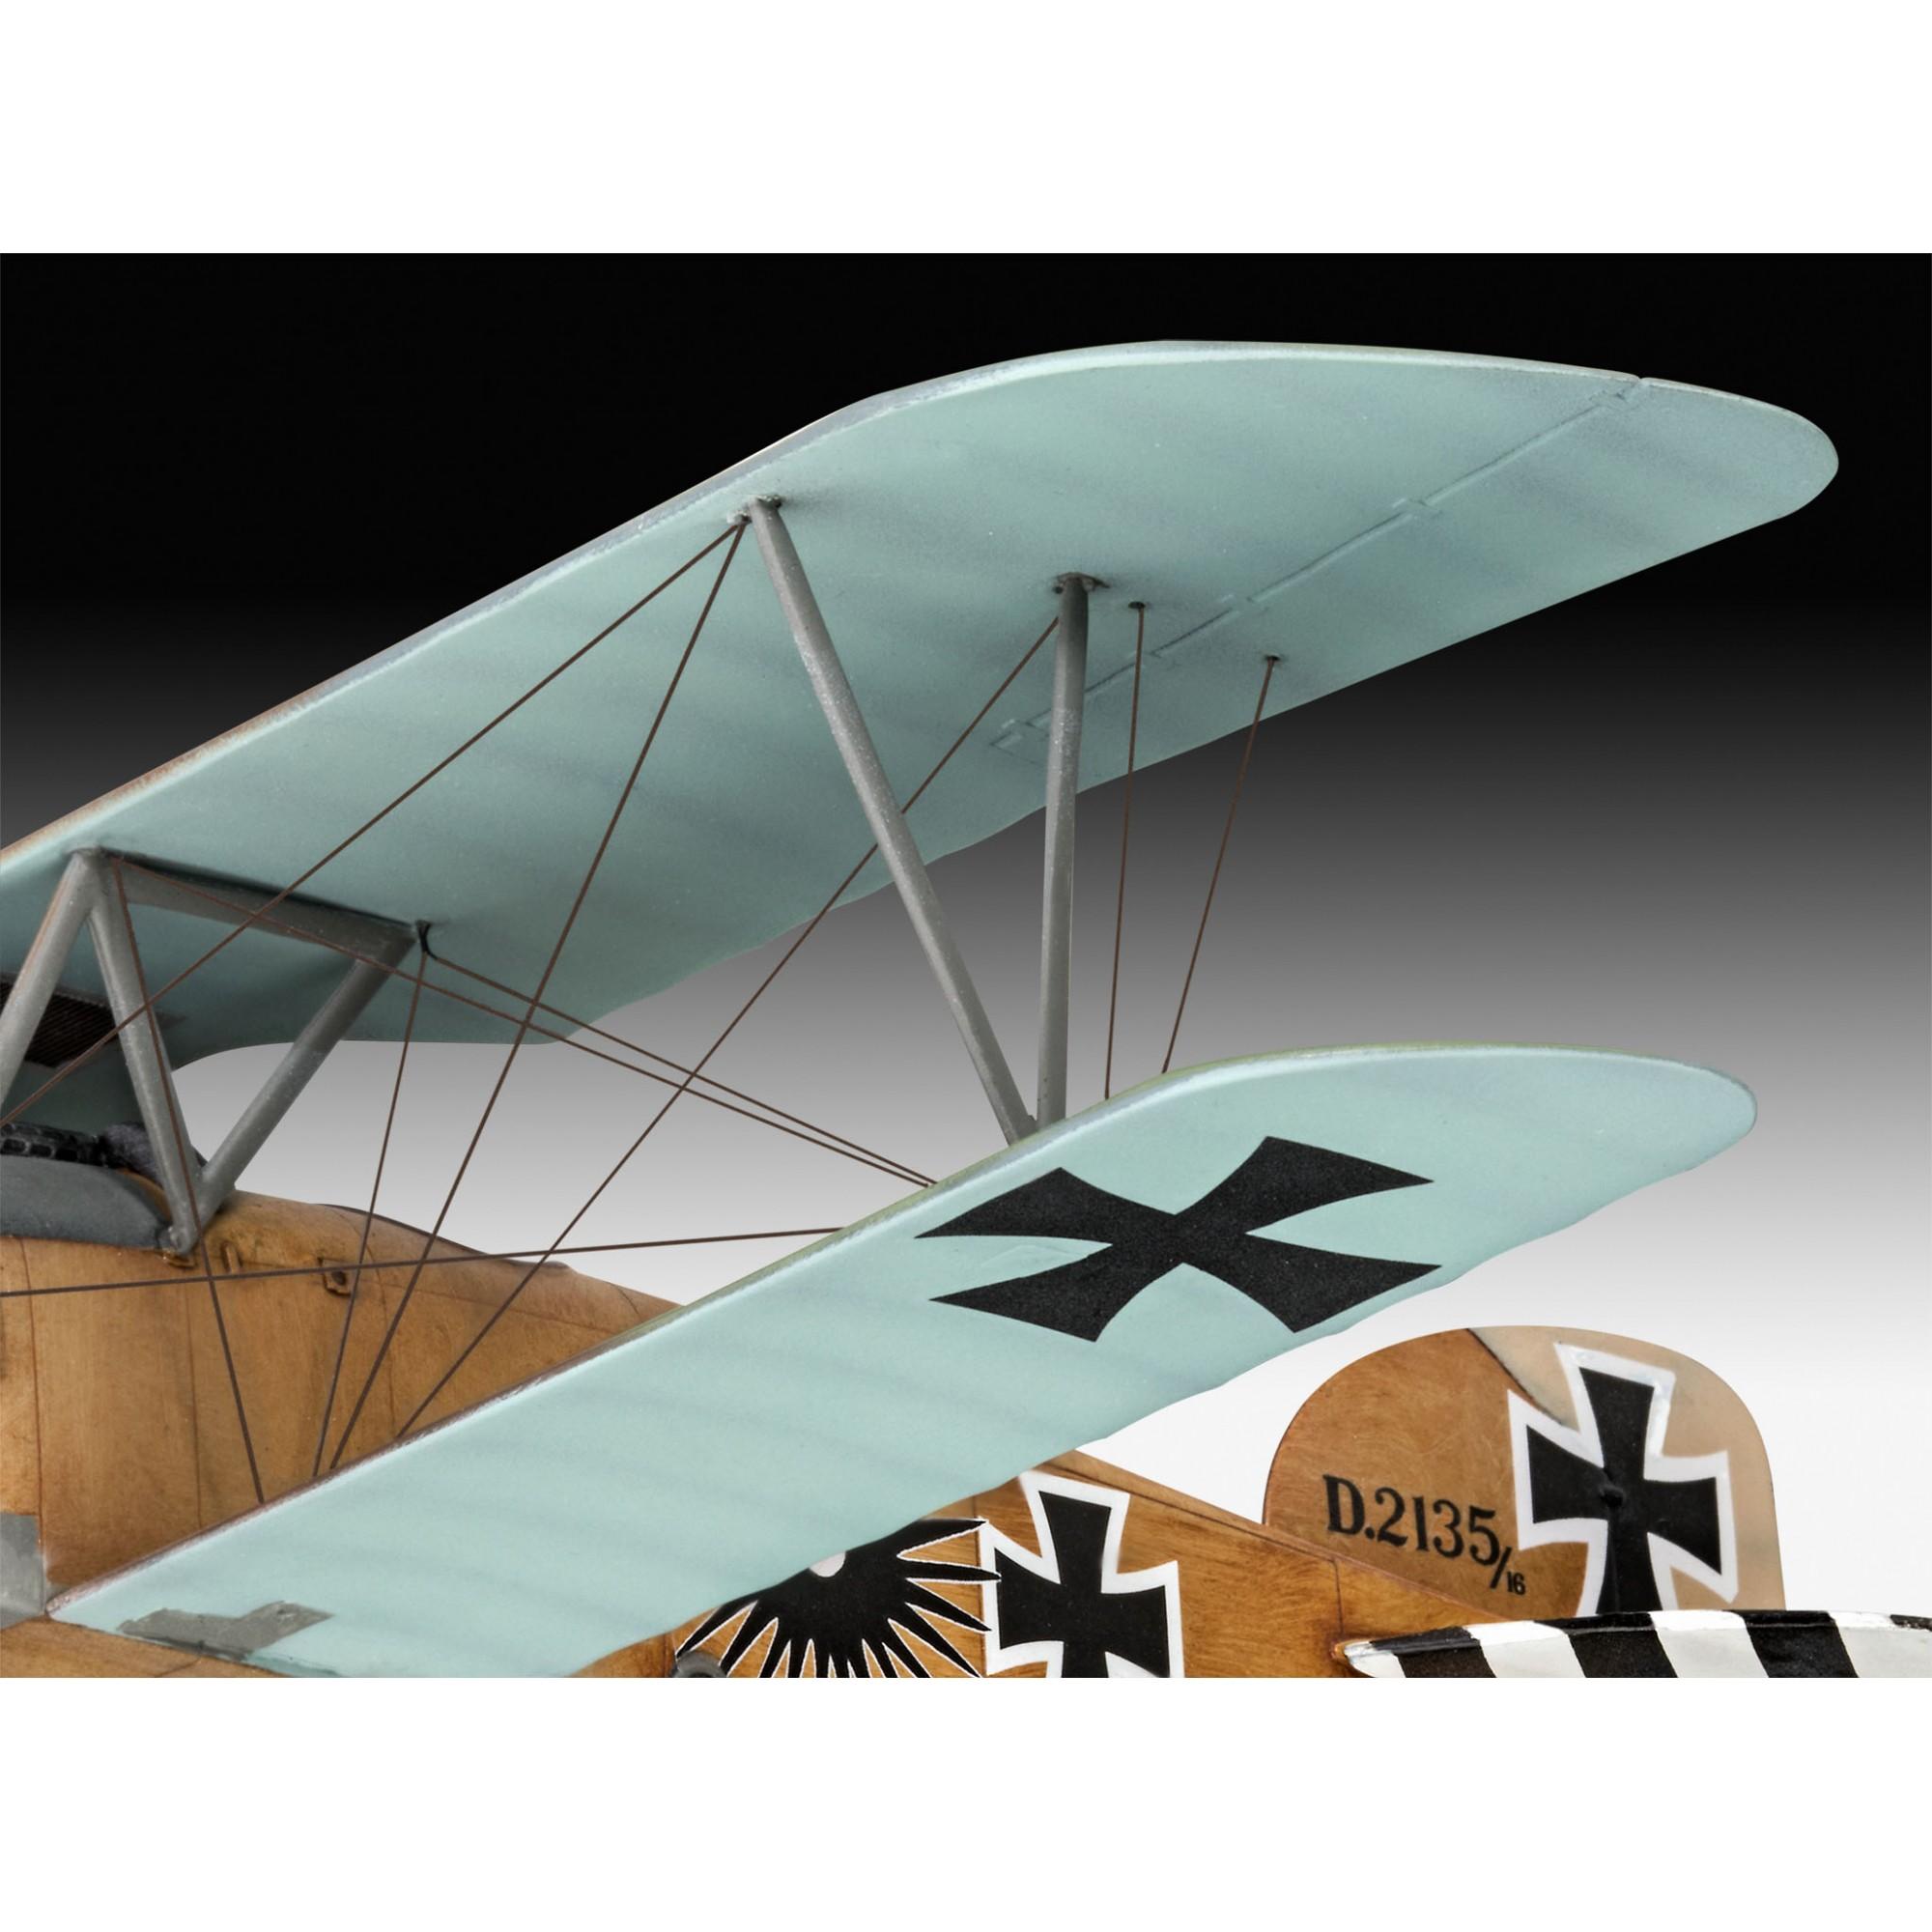 Albatros D.III - 1/48 - Revell 04973  - BLIMPS COMÉRCIO ELETRÔNICO